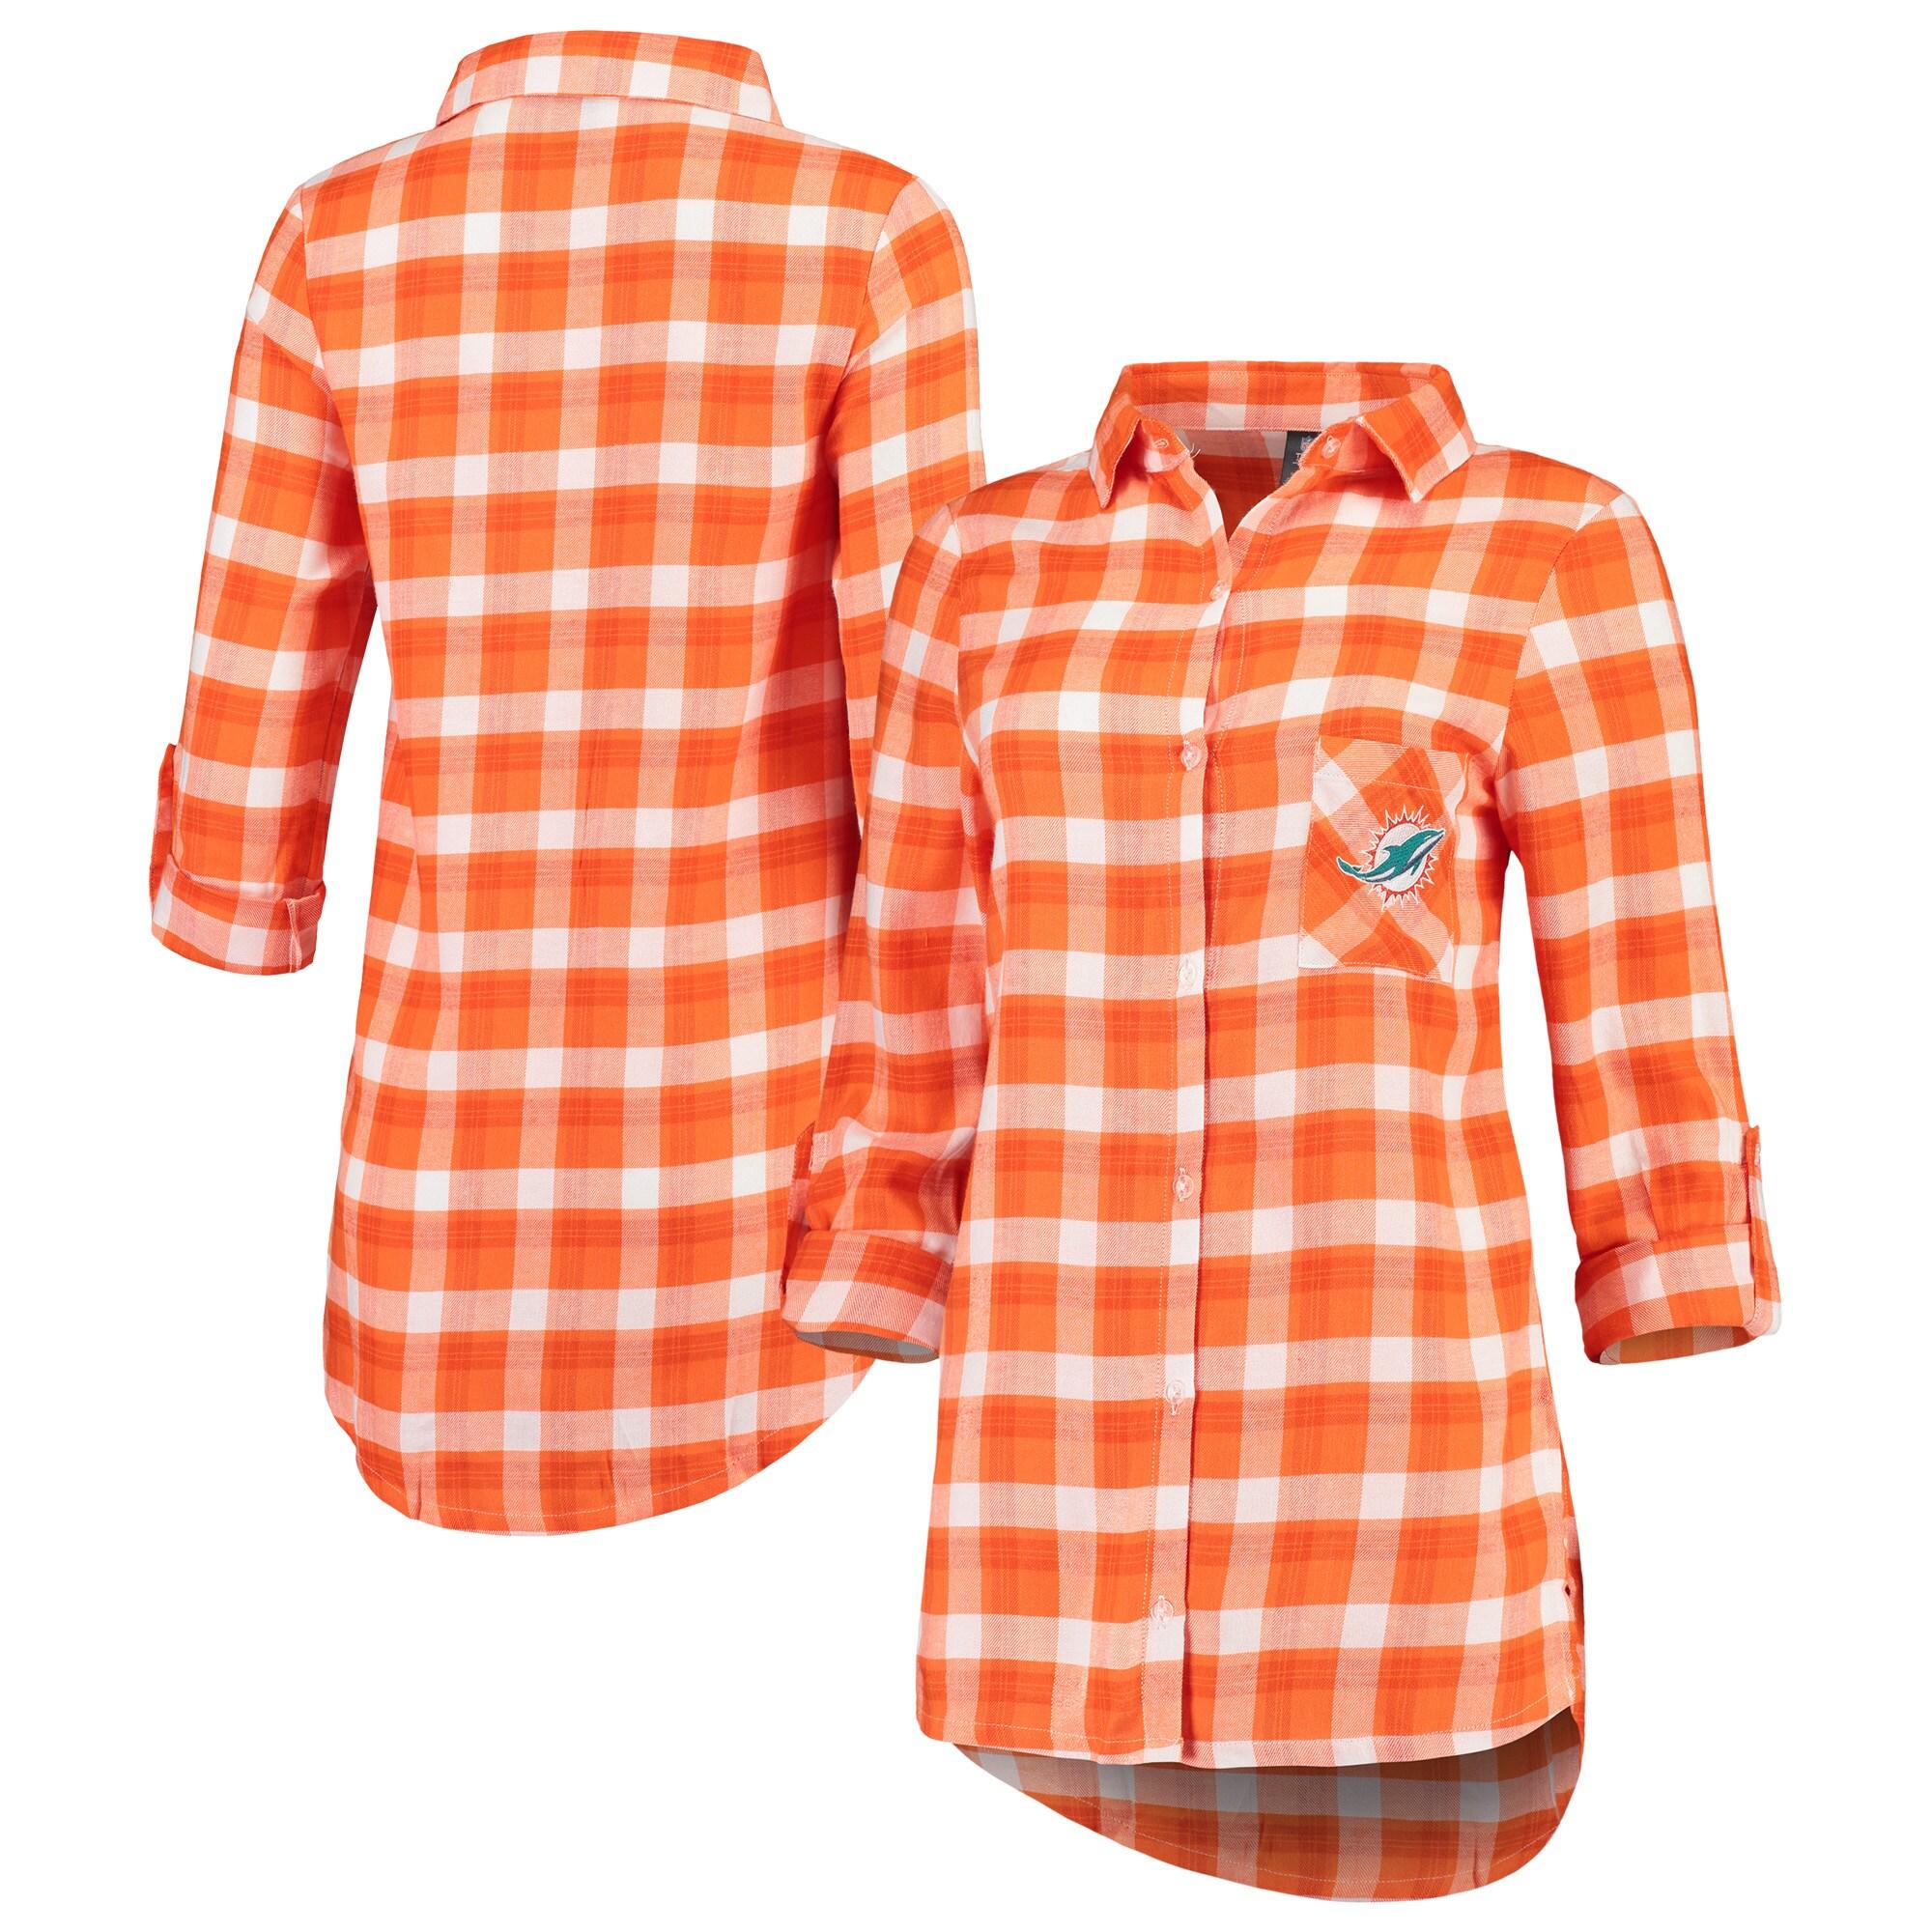 Miami Dolphins Concepts Sport Women's Piedmont Flannel Button-Up Long Sleeve Shirt - Orange/White